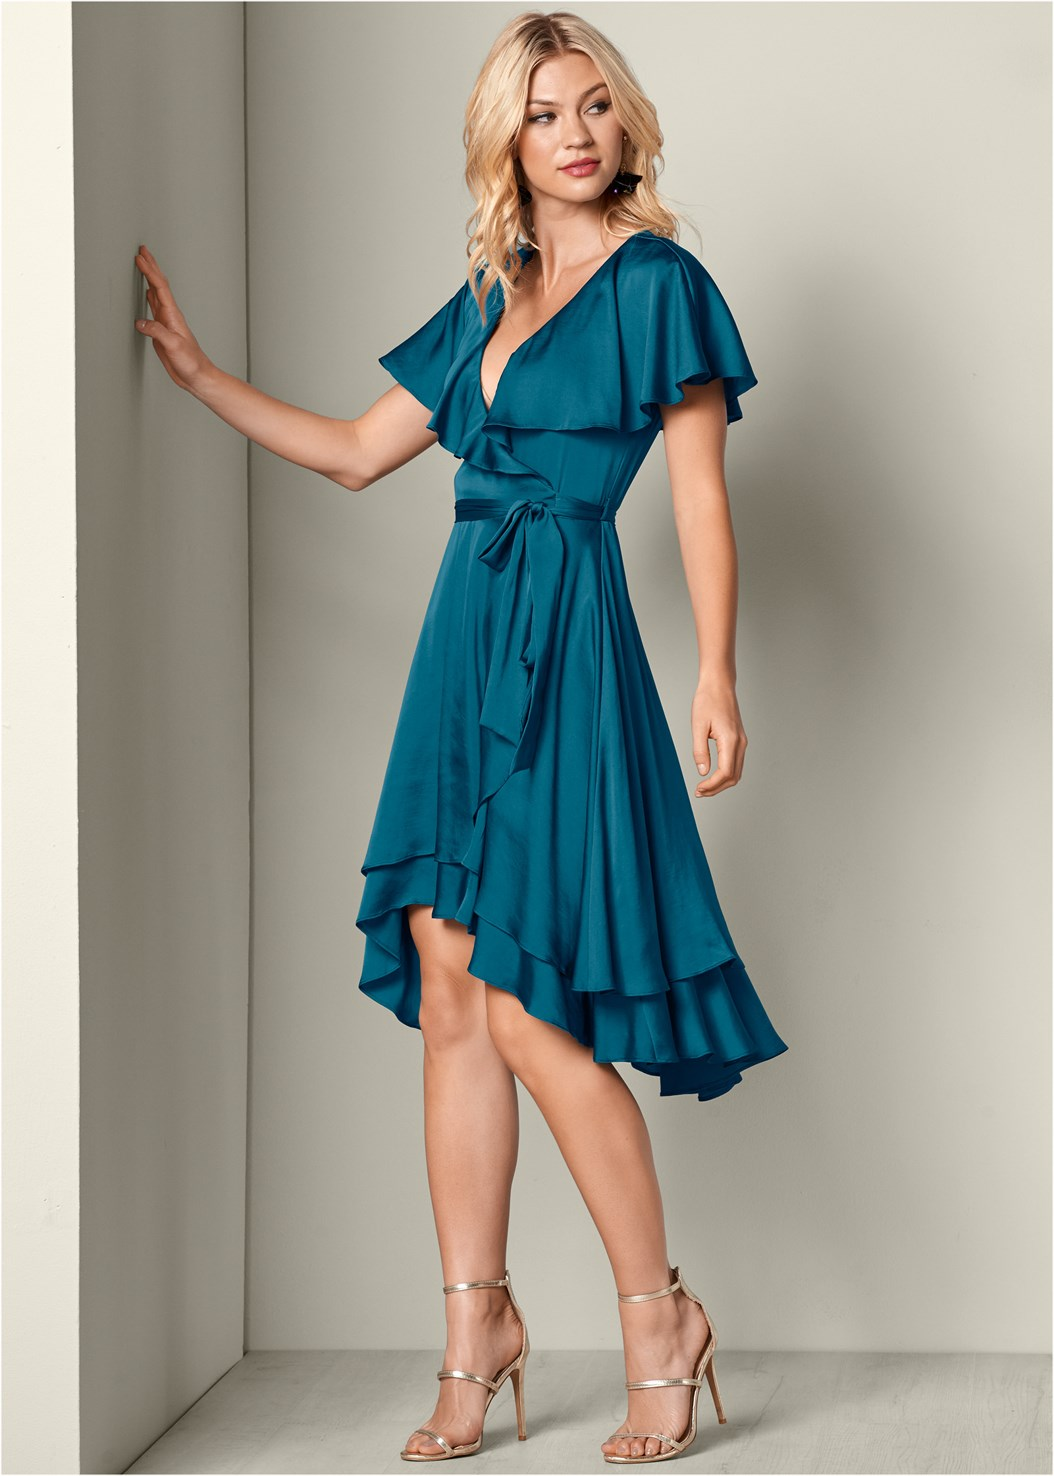 Ruffle Detail Wrap Dress,High Heel Strappy Sandals